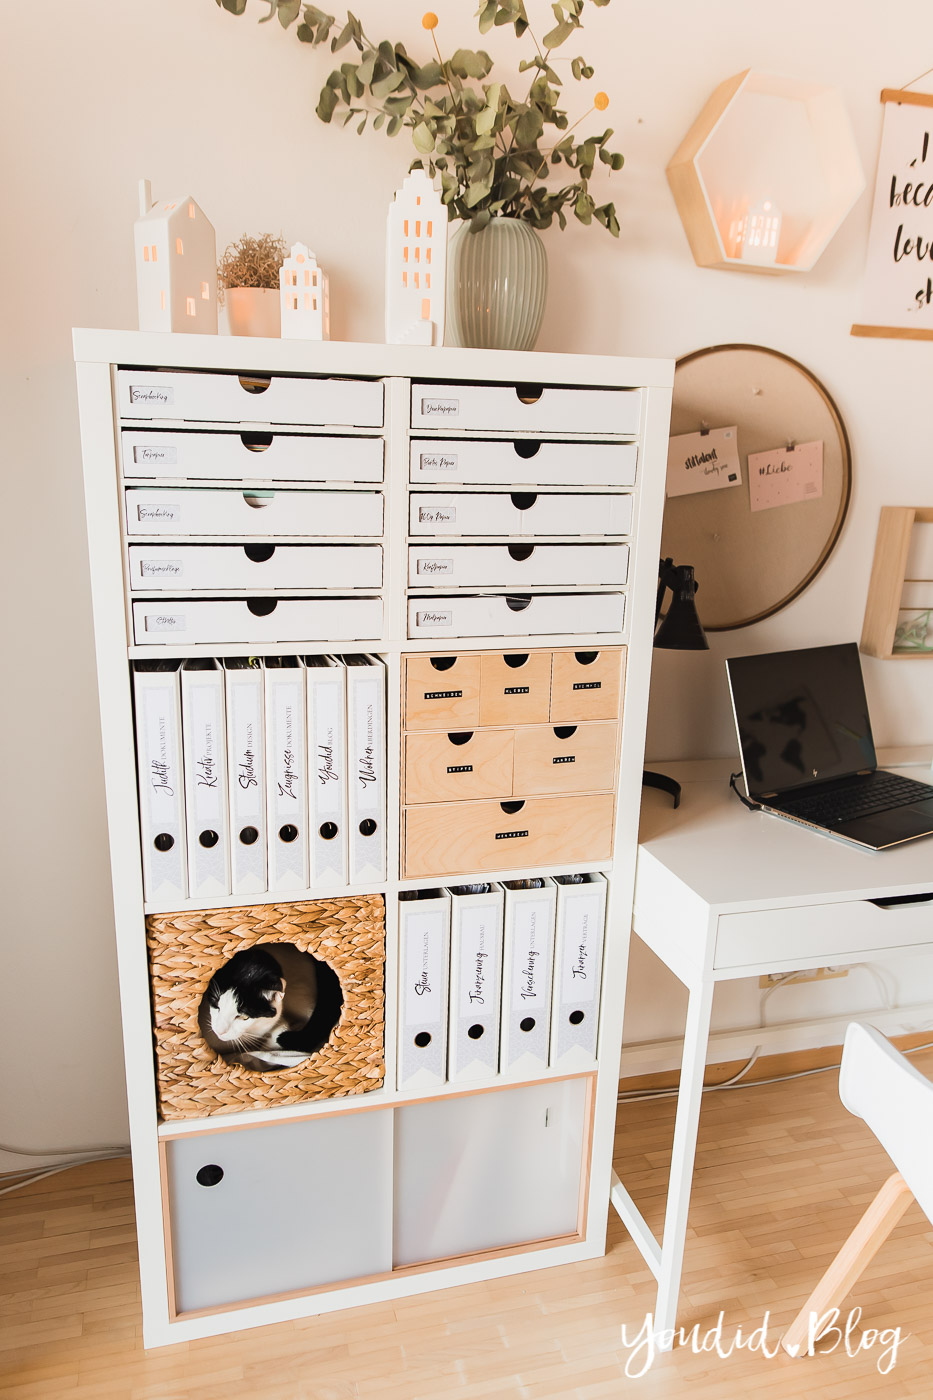 Ikea Kallax Pimp: Stilvolles Untergestell aus Holz | New